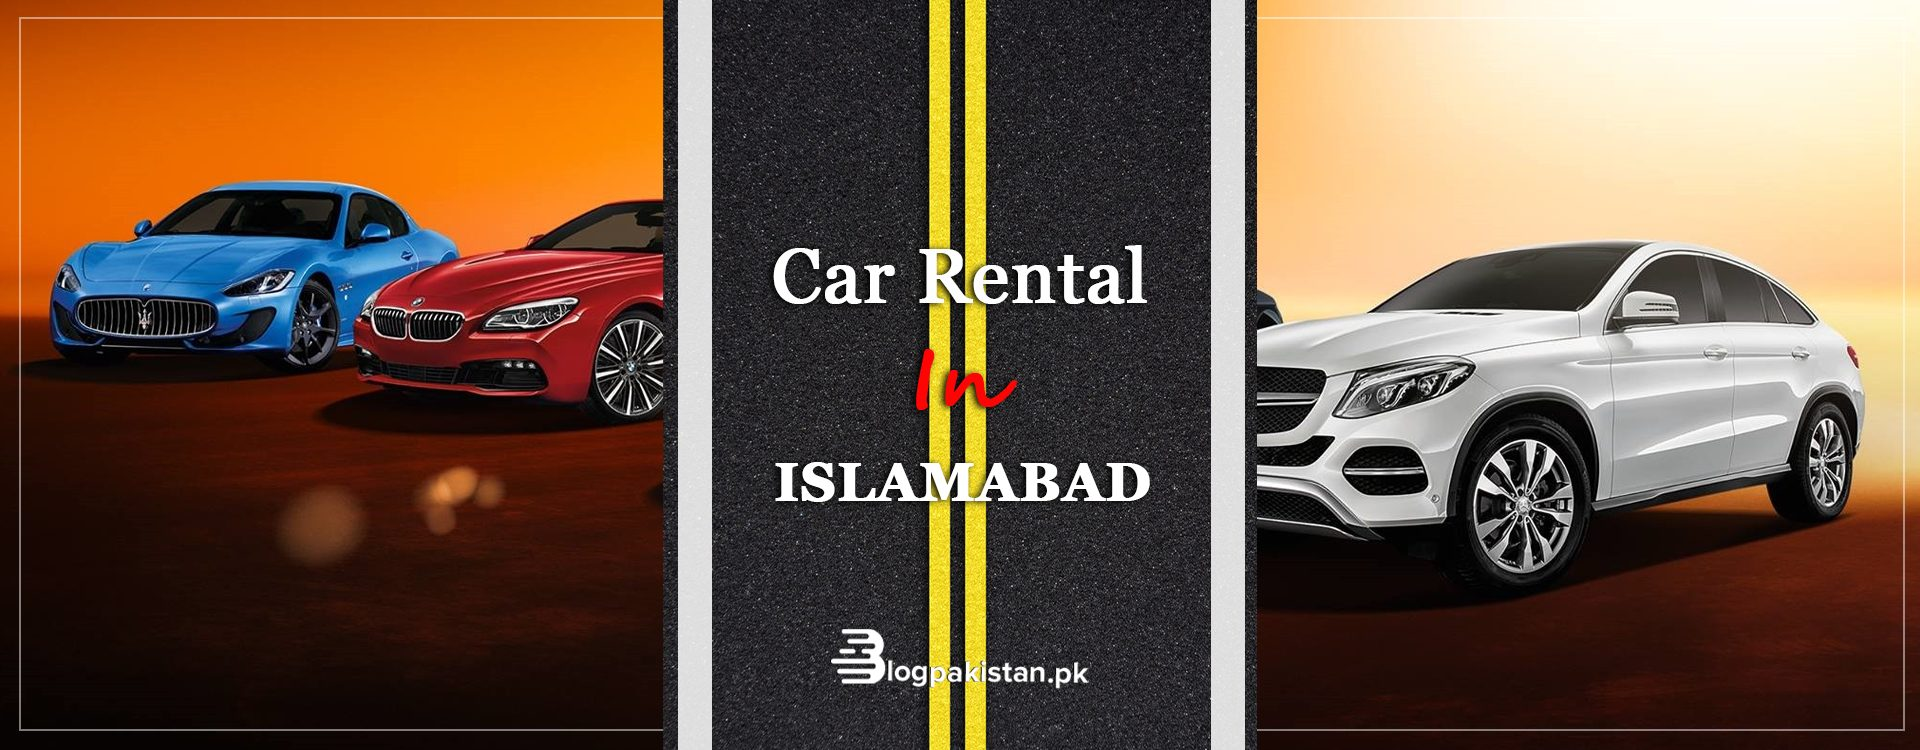 Car Rental in Islamabad